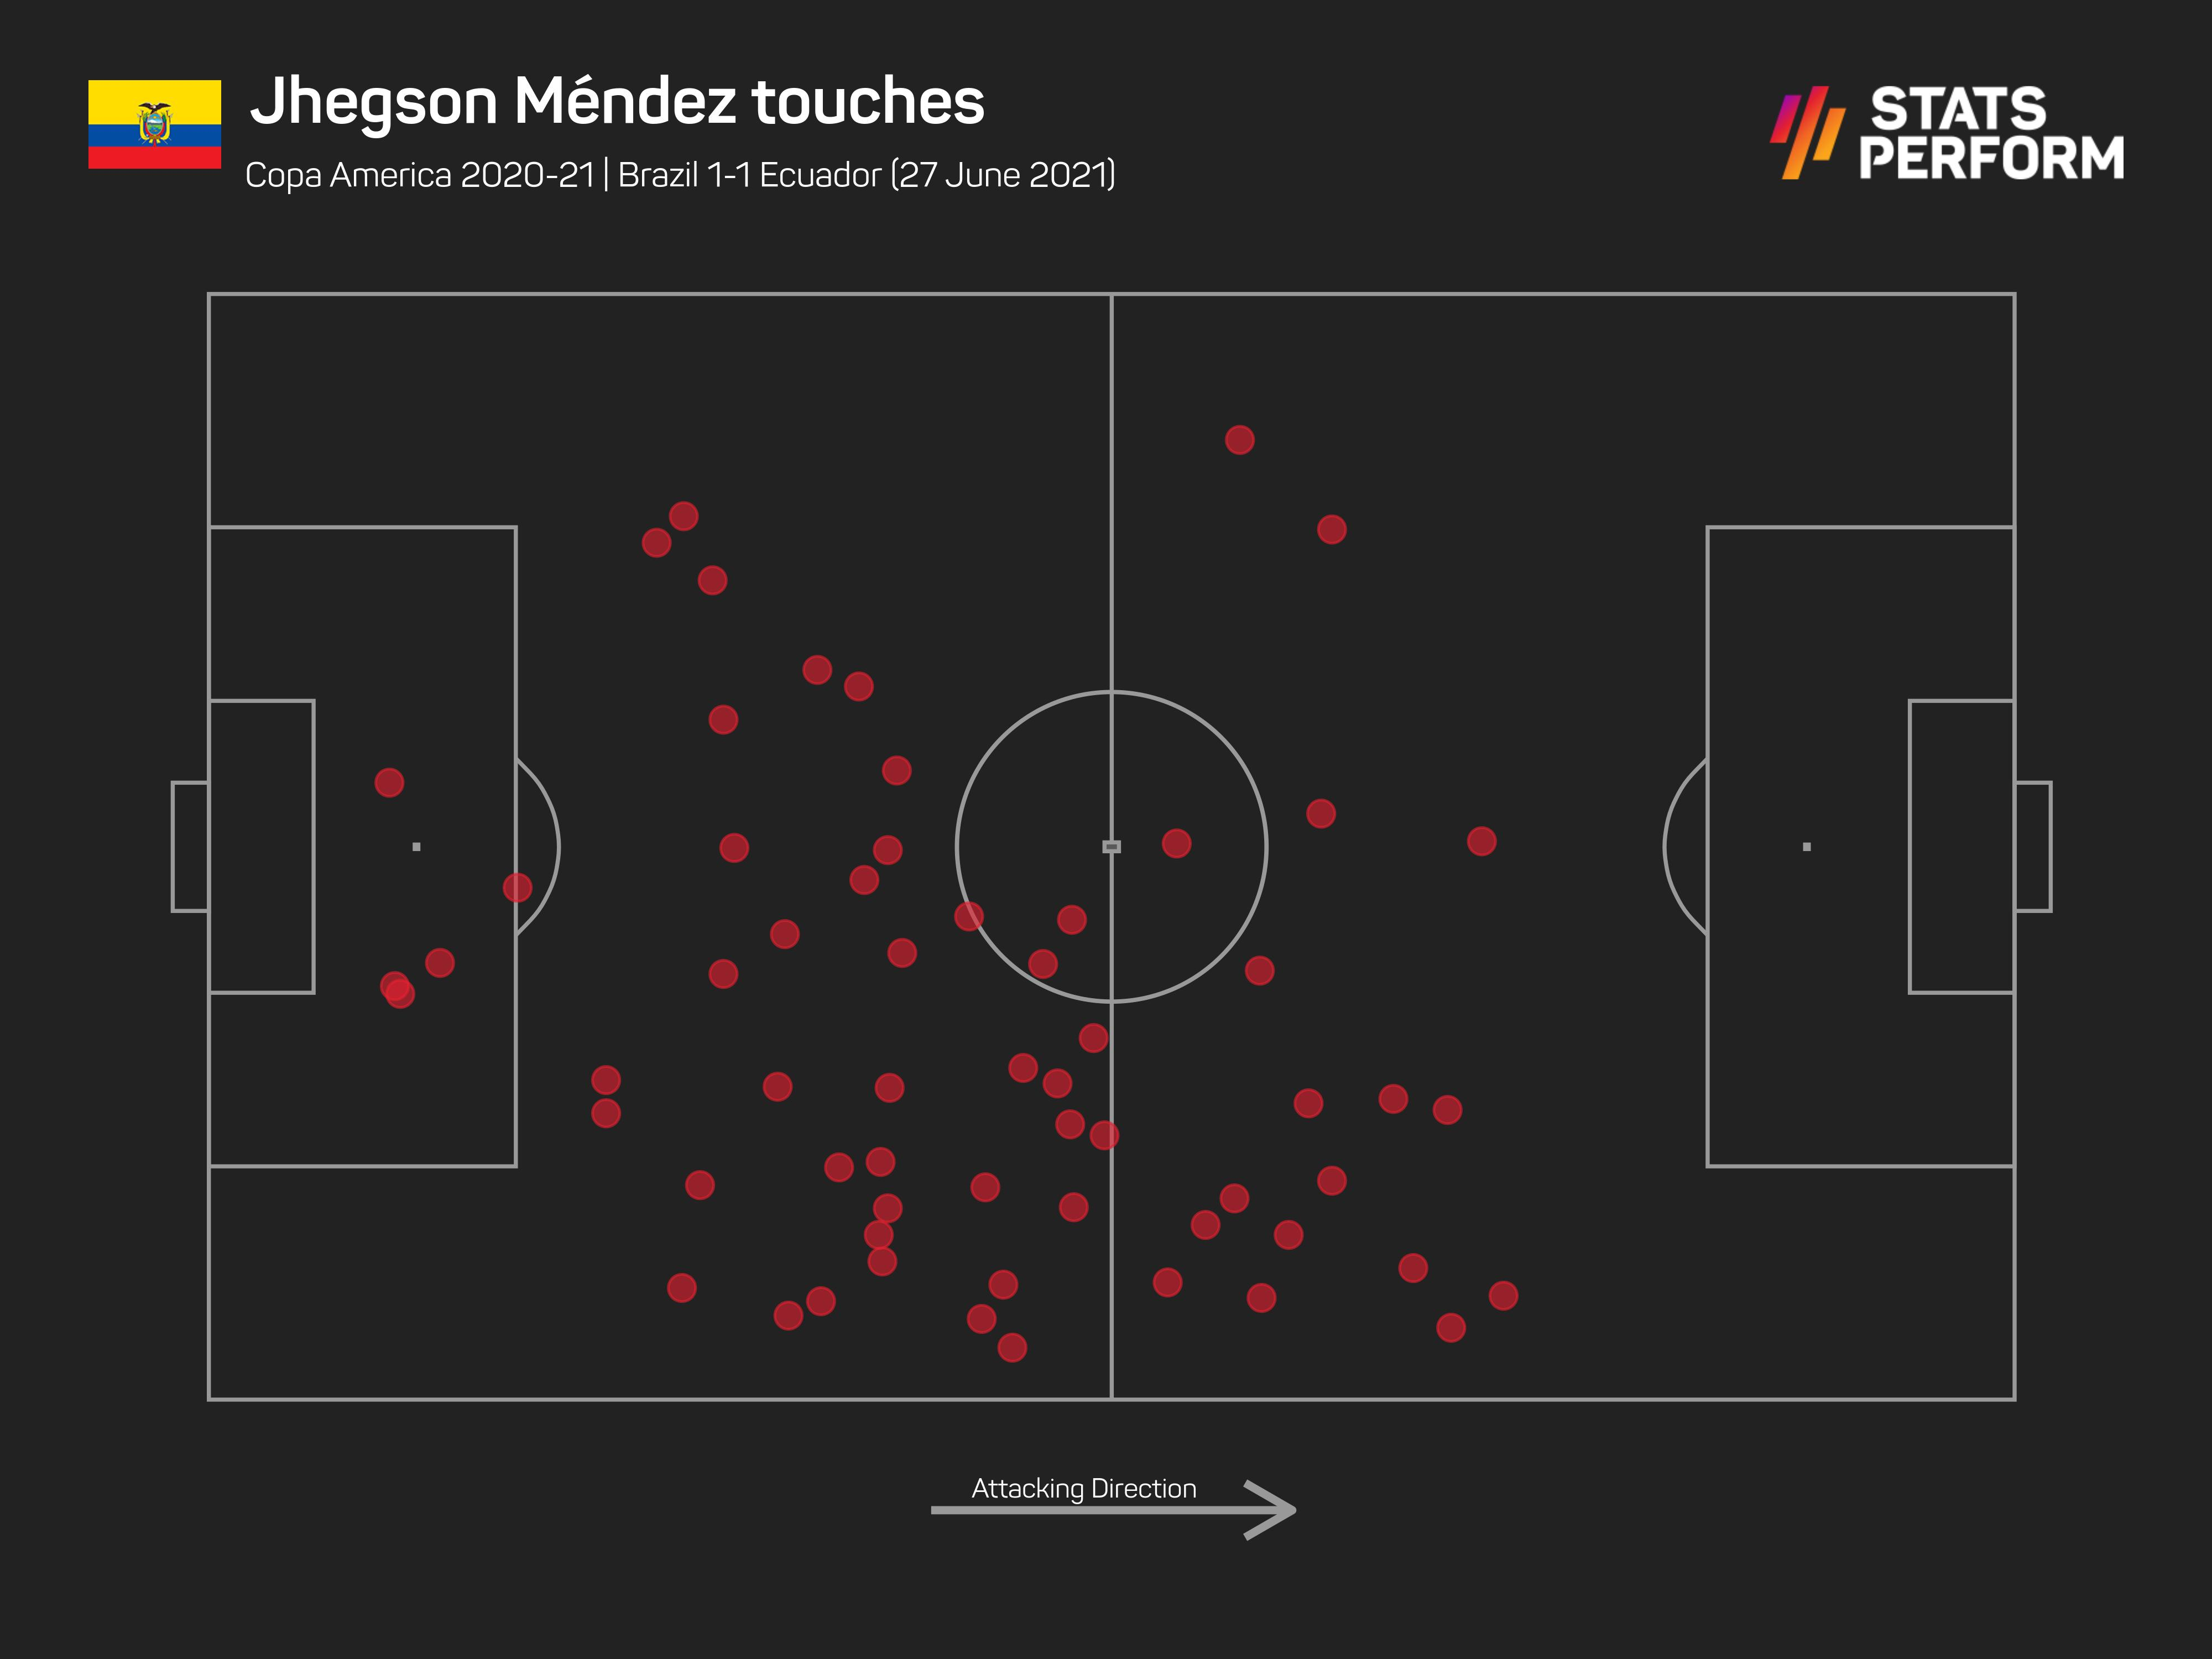 Jhegson Mendez touch map